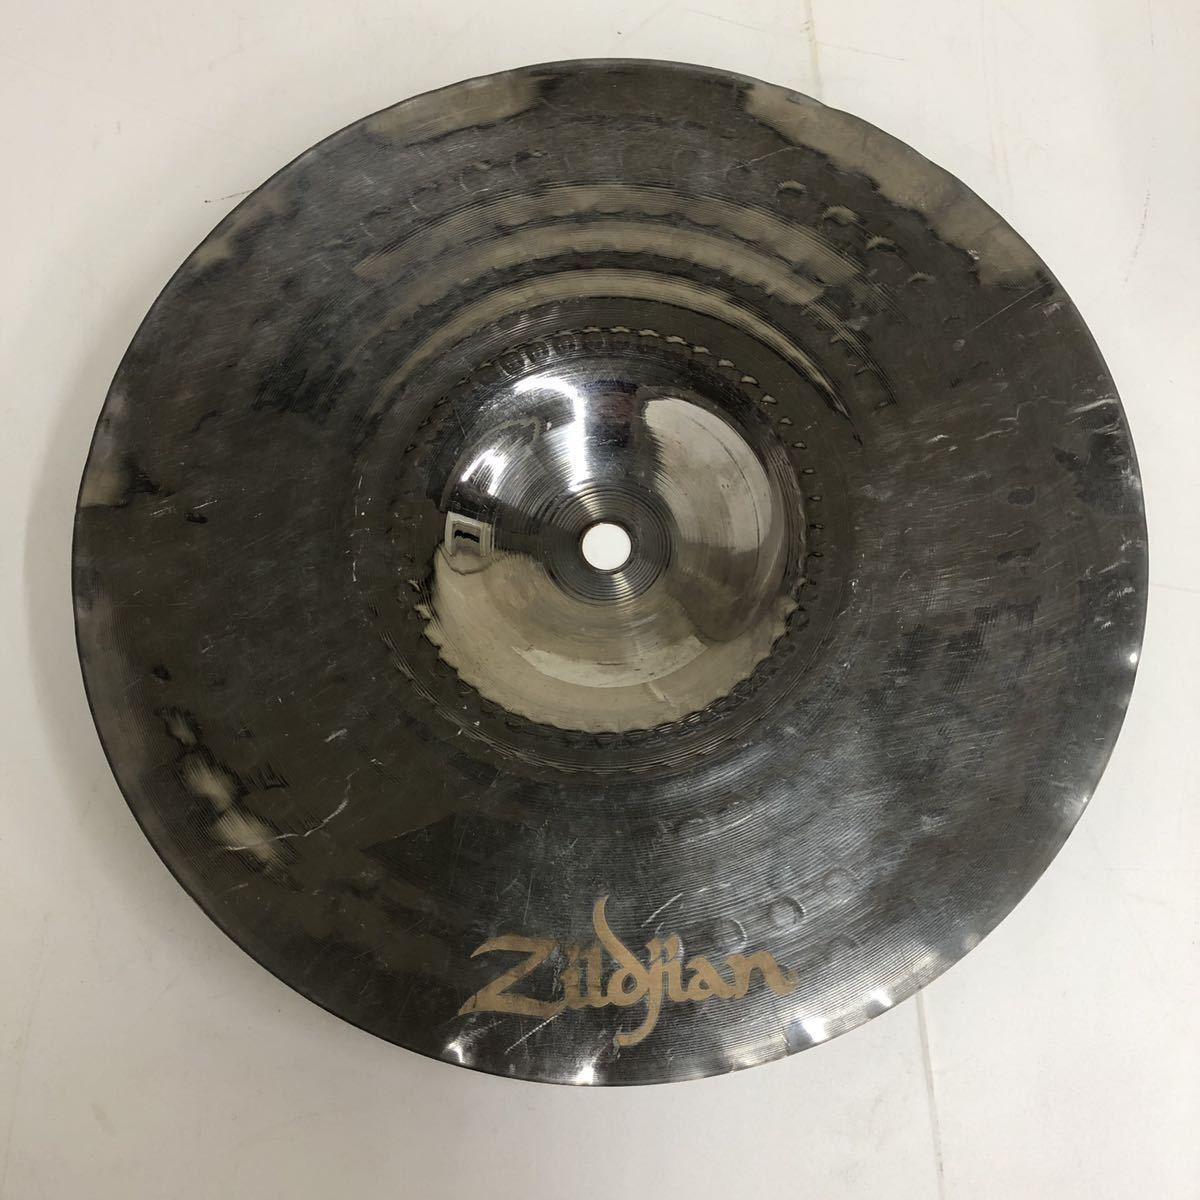 □Zildjian ジルジャン ZXT TITANIUM Flash Splash シンバル ドラム 打楽器 楽器 10インチ スプラッシュ パーカッション □21073005_画像3